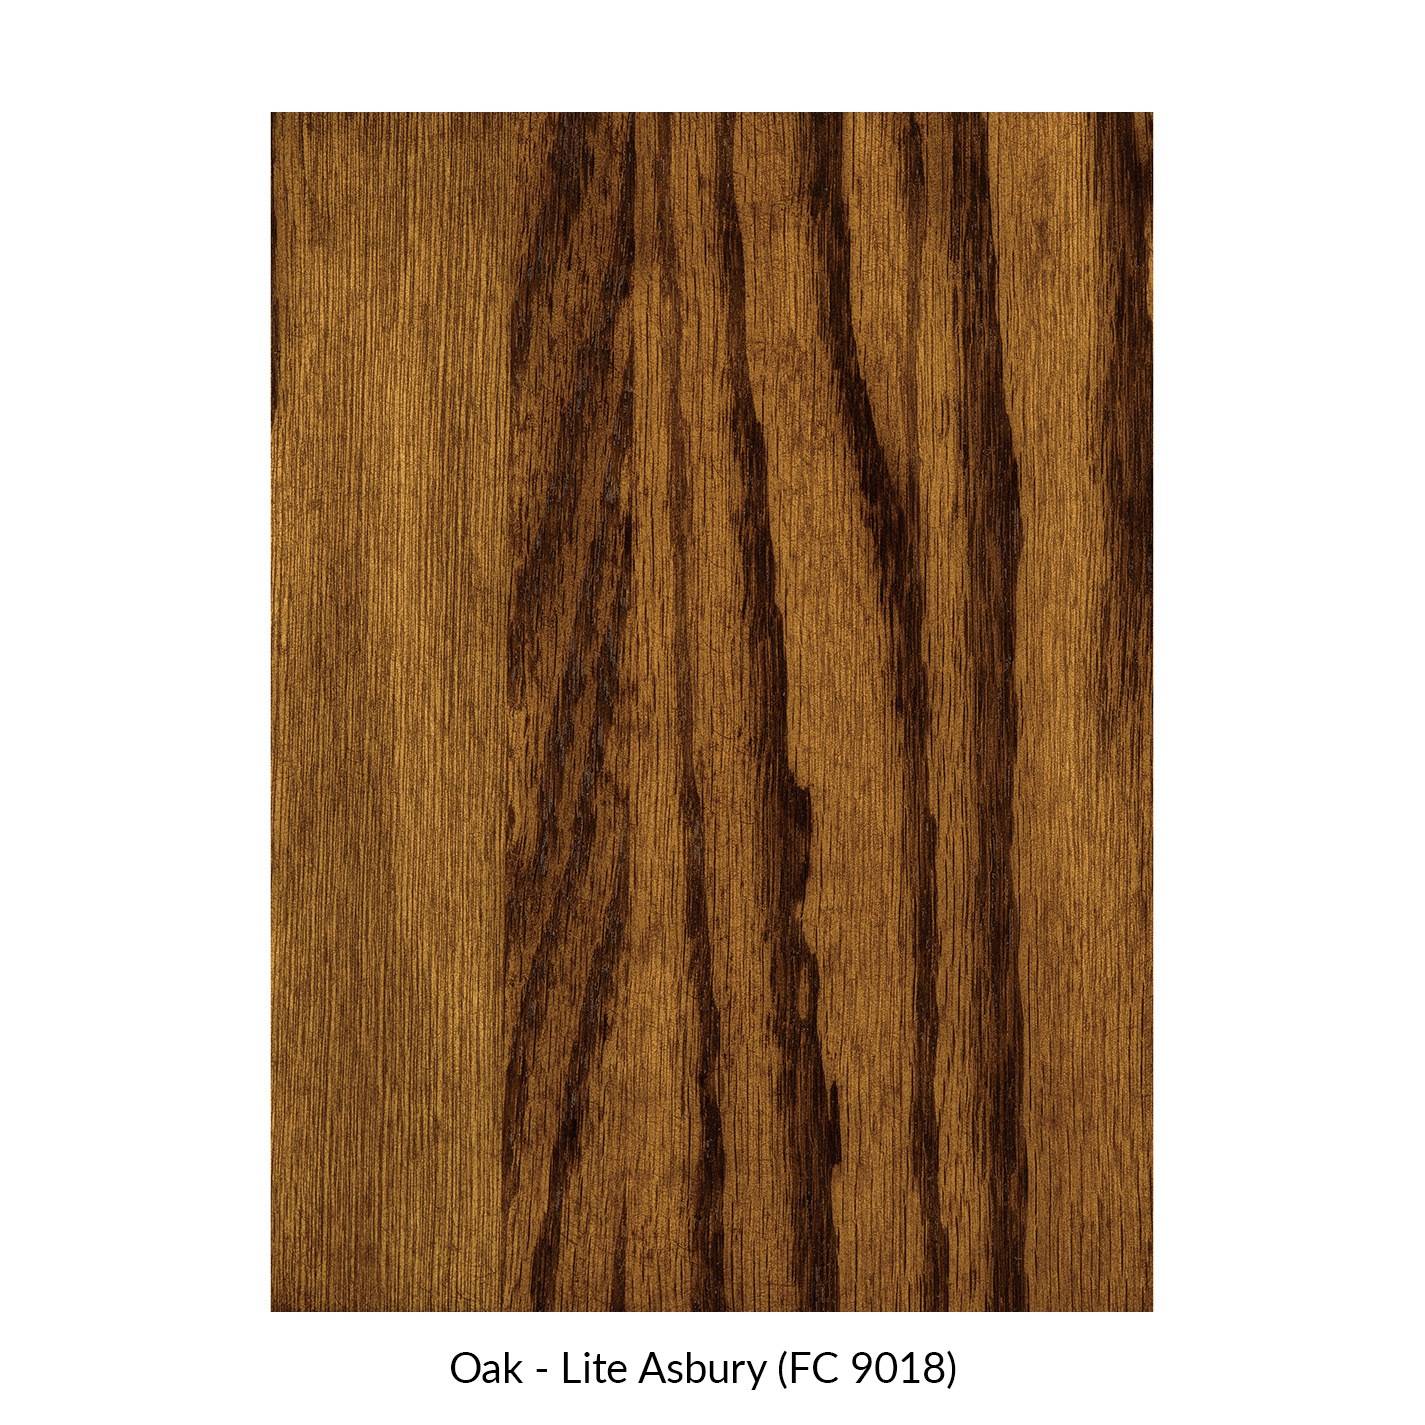 spectrum-oak-lite-asbury-fc-9018.jpg